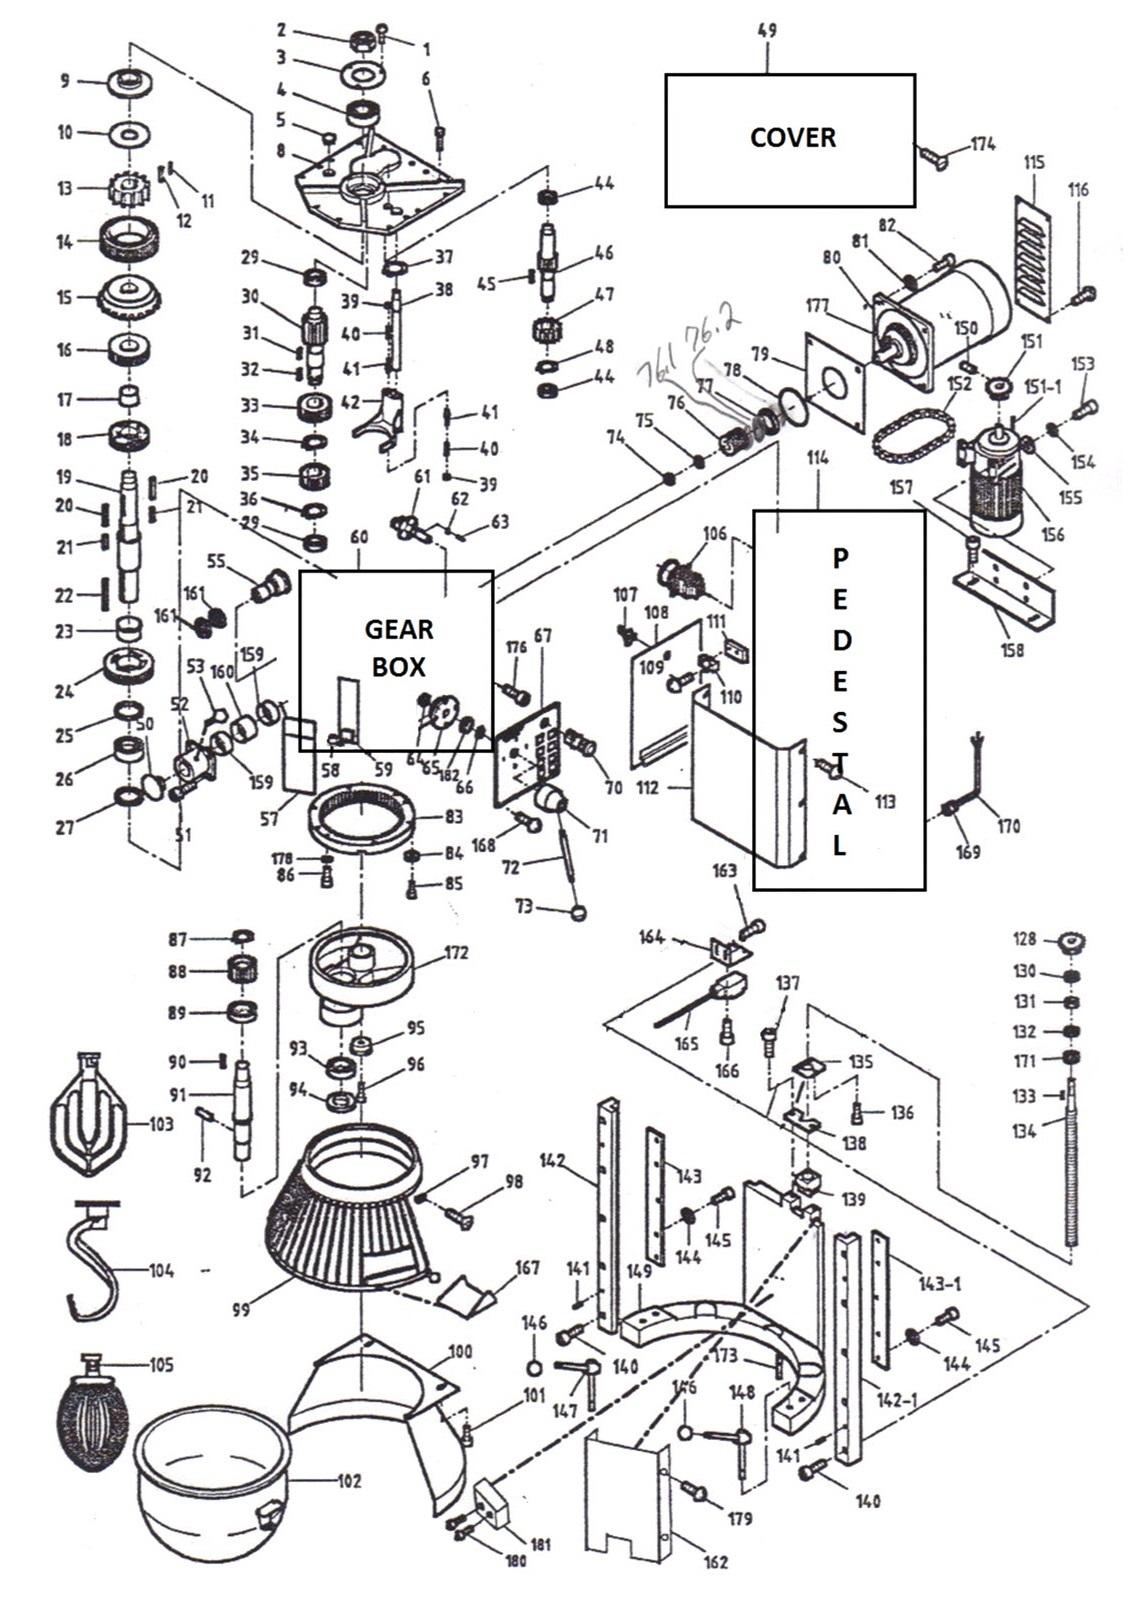 Thunderbird ARM-60 Parts Diagram | Parts TownParts Town